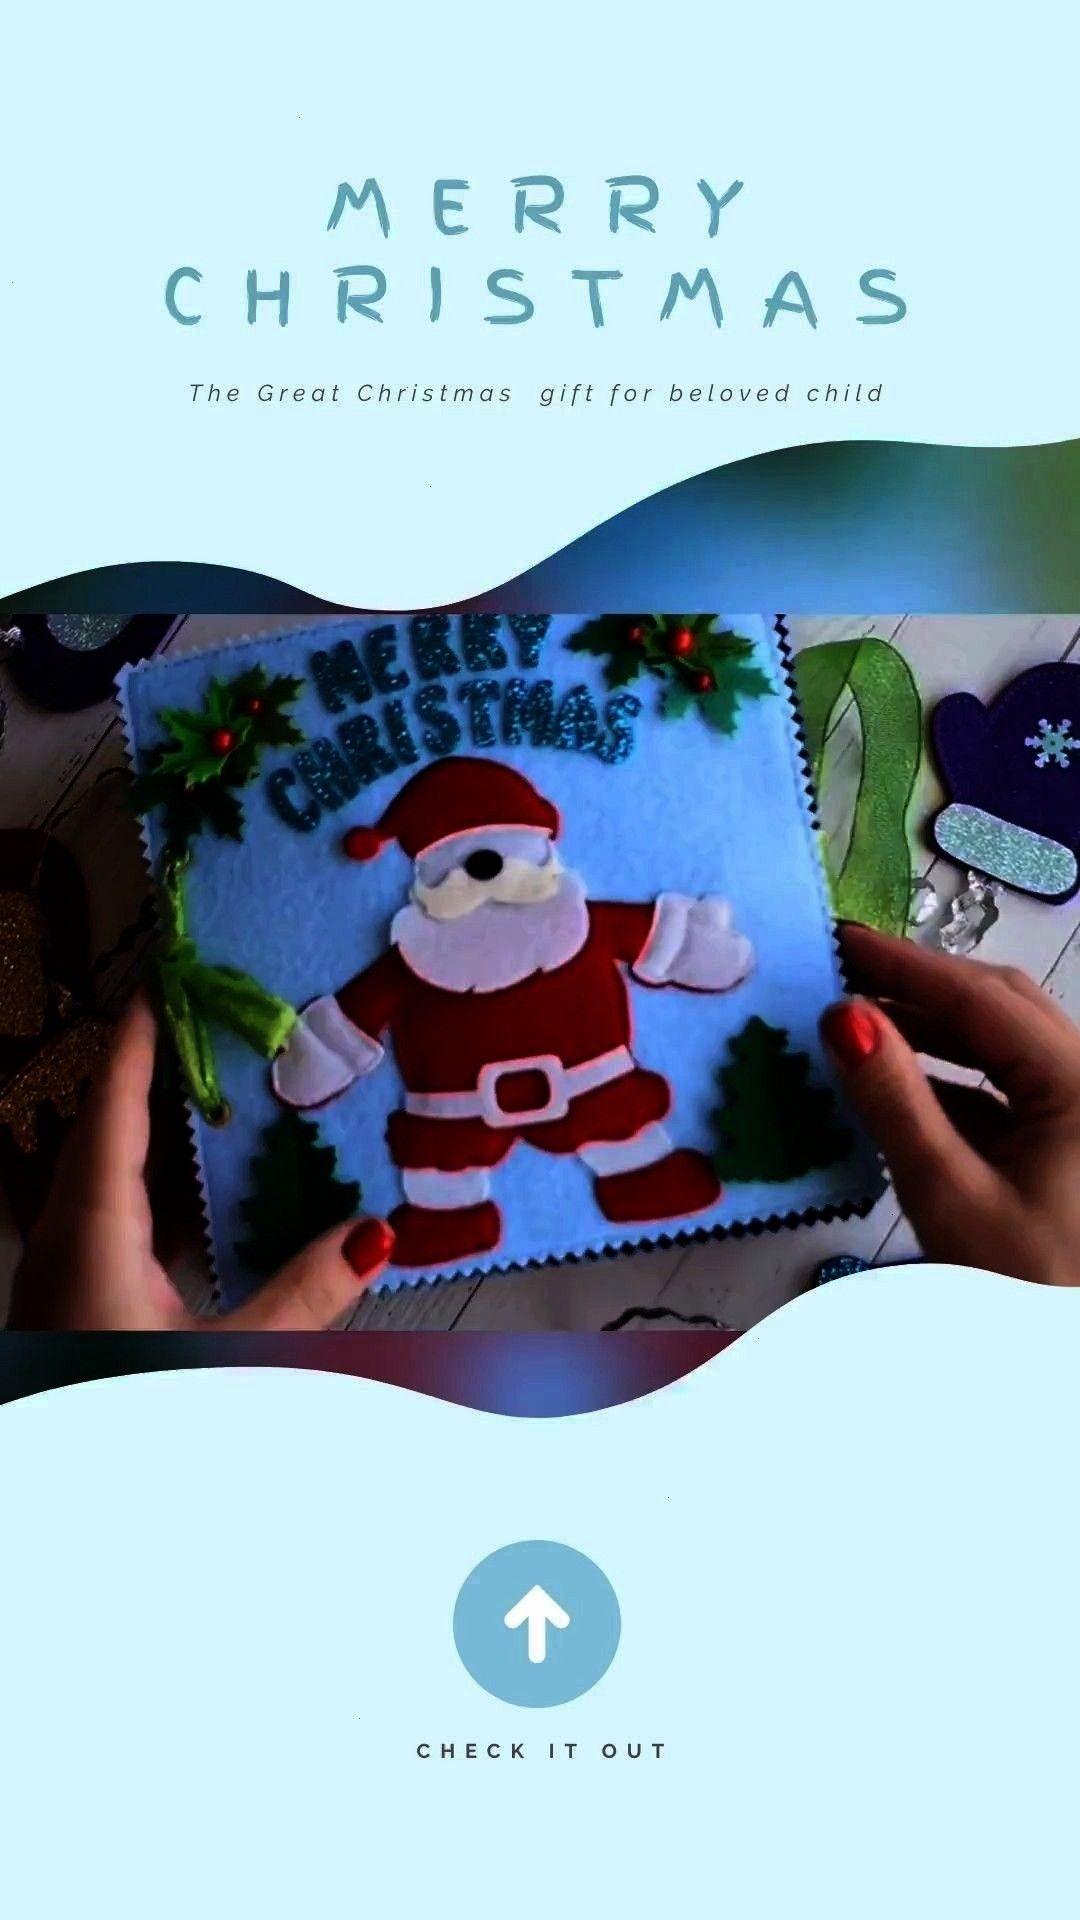 xmas quiet book fine motor skill toy montessori kids sensory pl Christmas busy book unisex xmas quiet book fine motor skill toy montessori kids sensory play  Christmas bu...